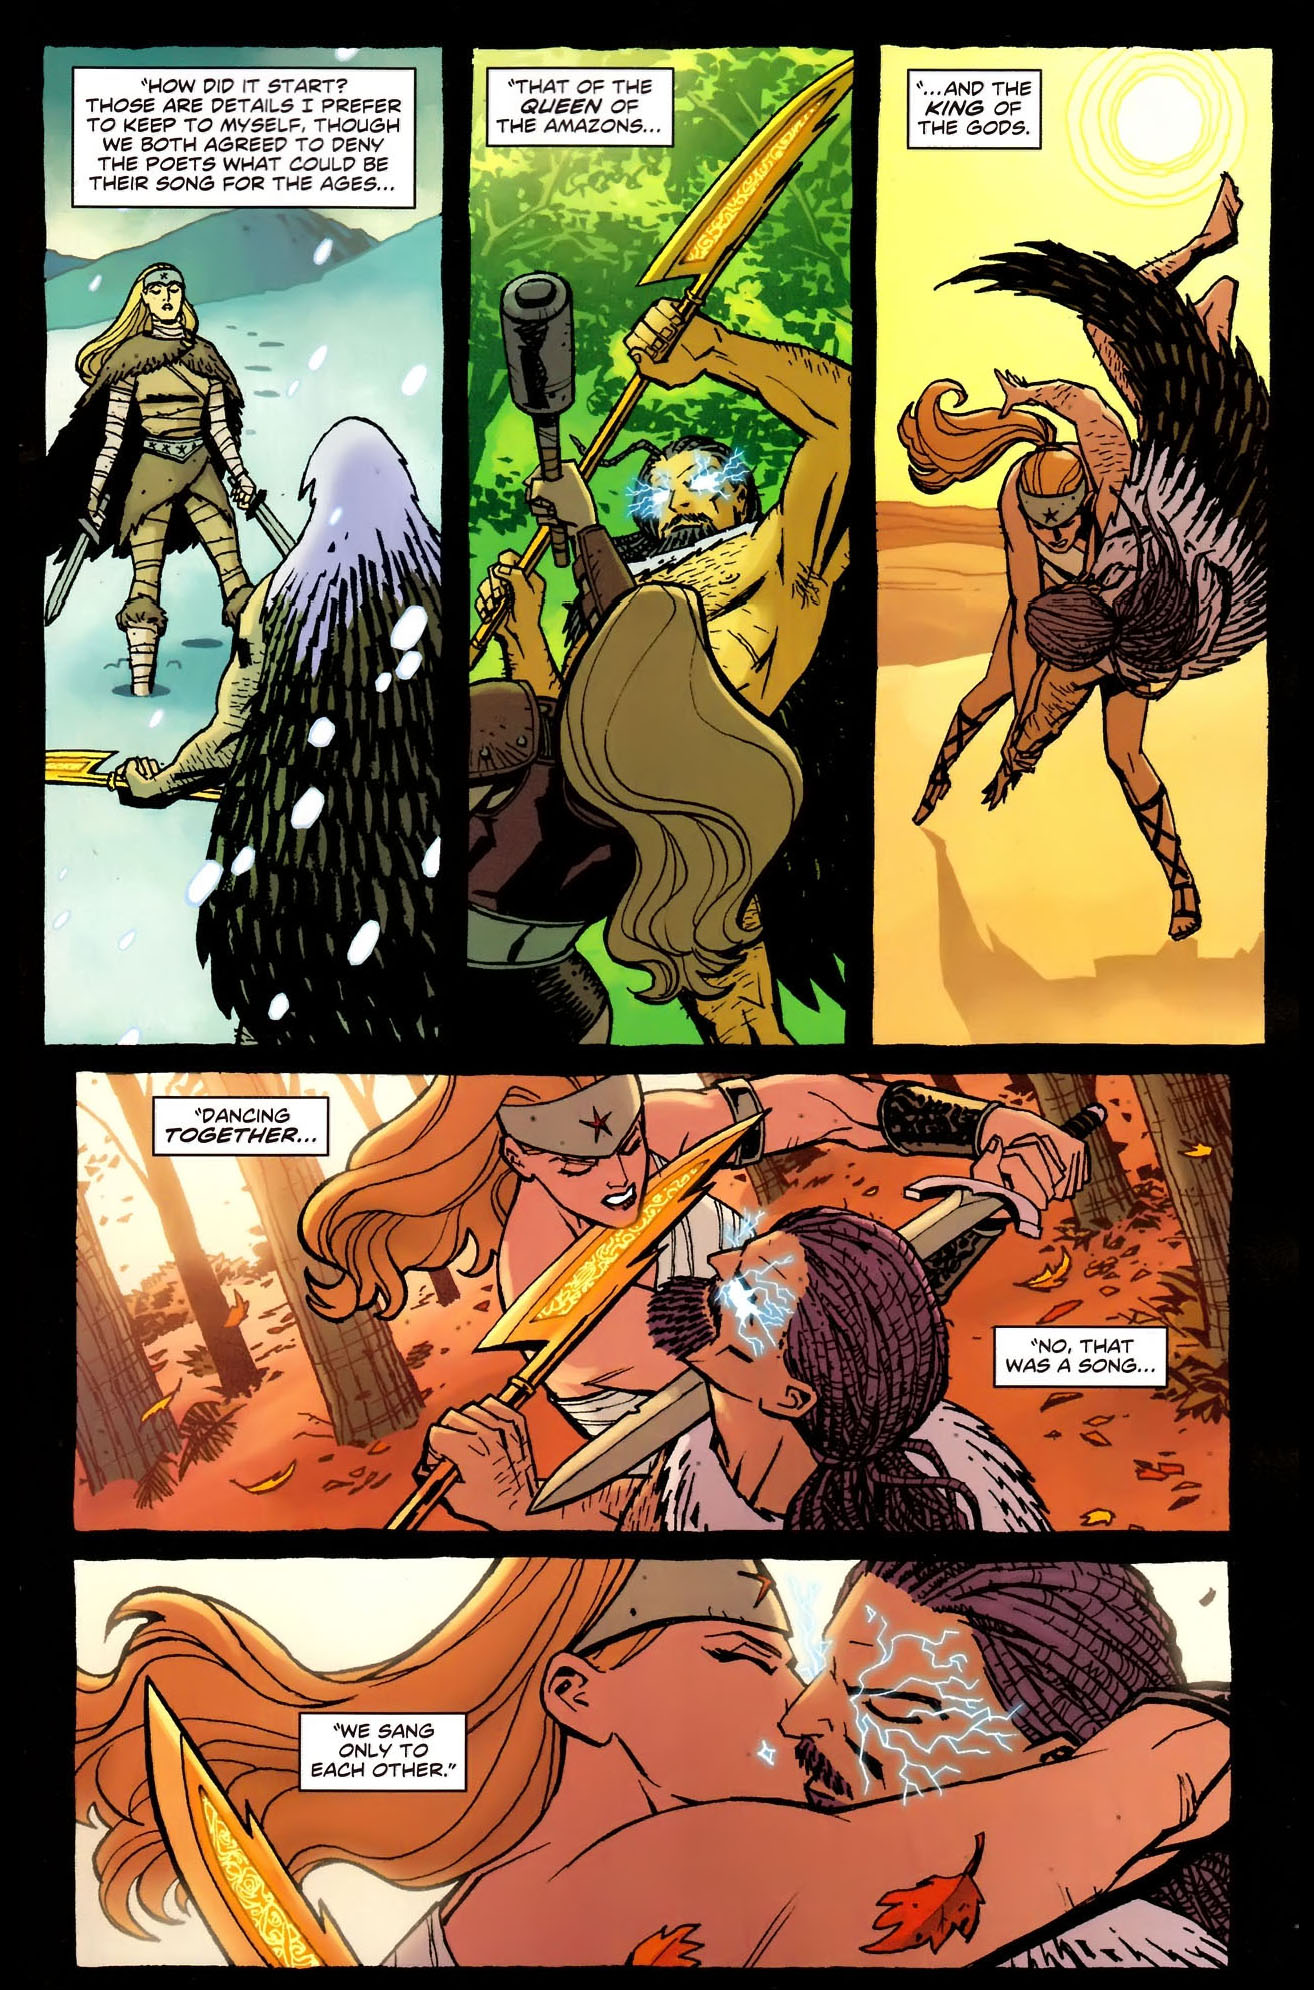 Wonder Woman's New 52 Origin Story 2